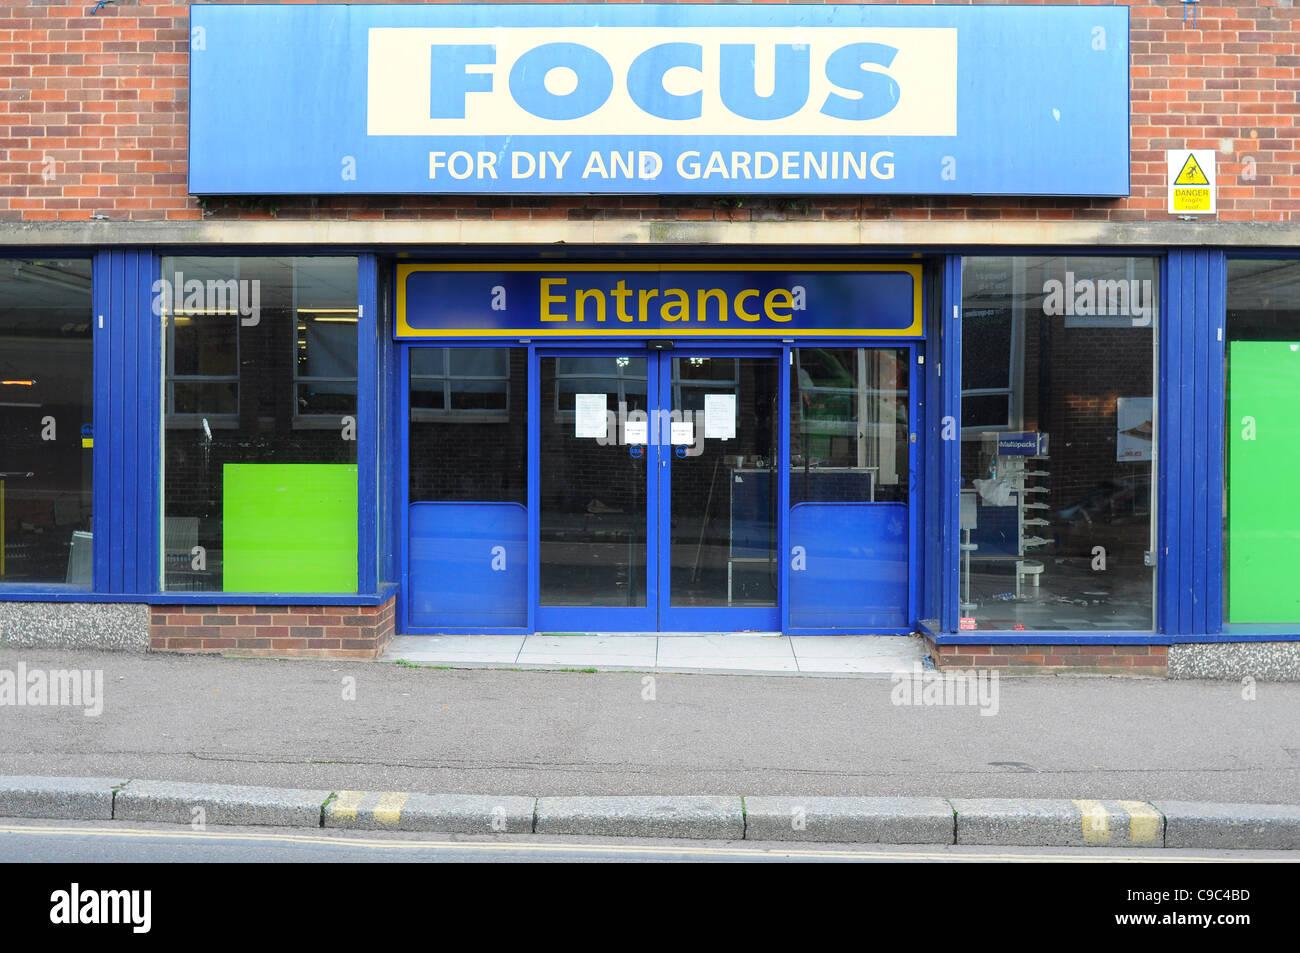 In bancarotta Focus DIY negozio chiuso. Immagini Stock